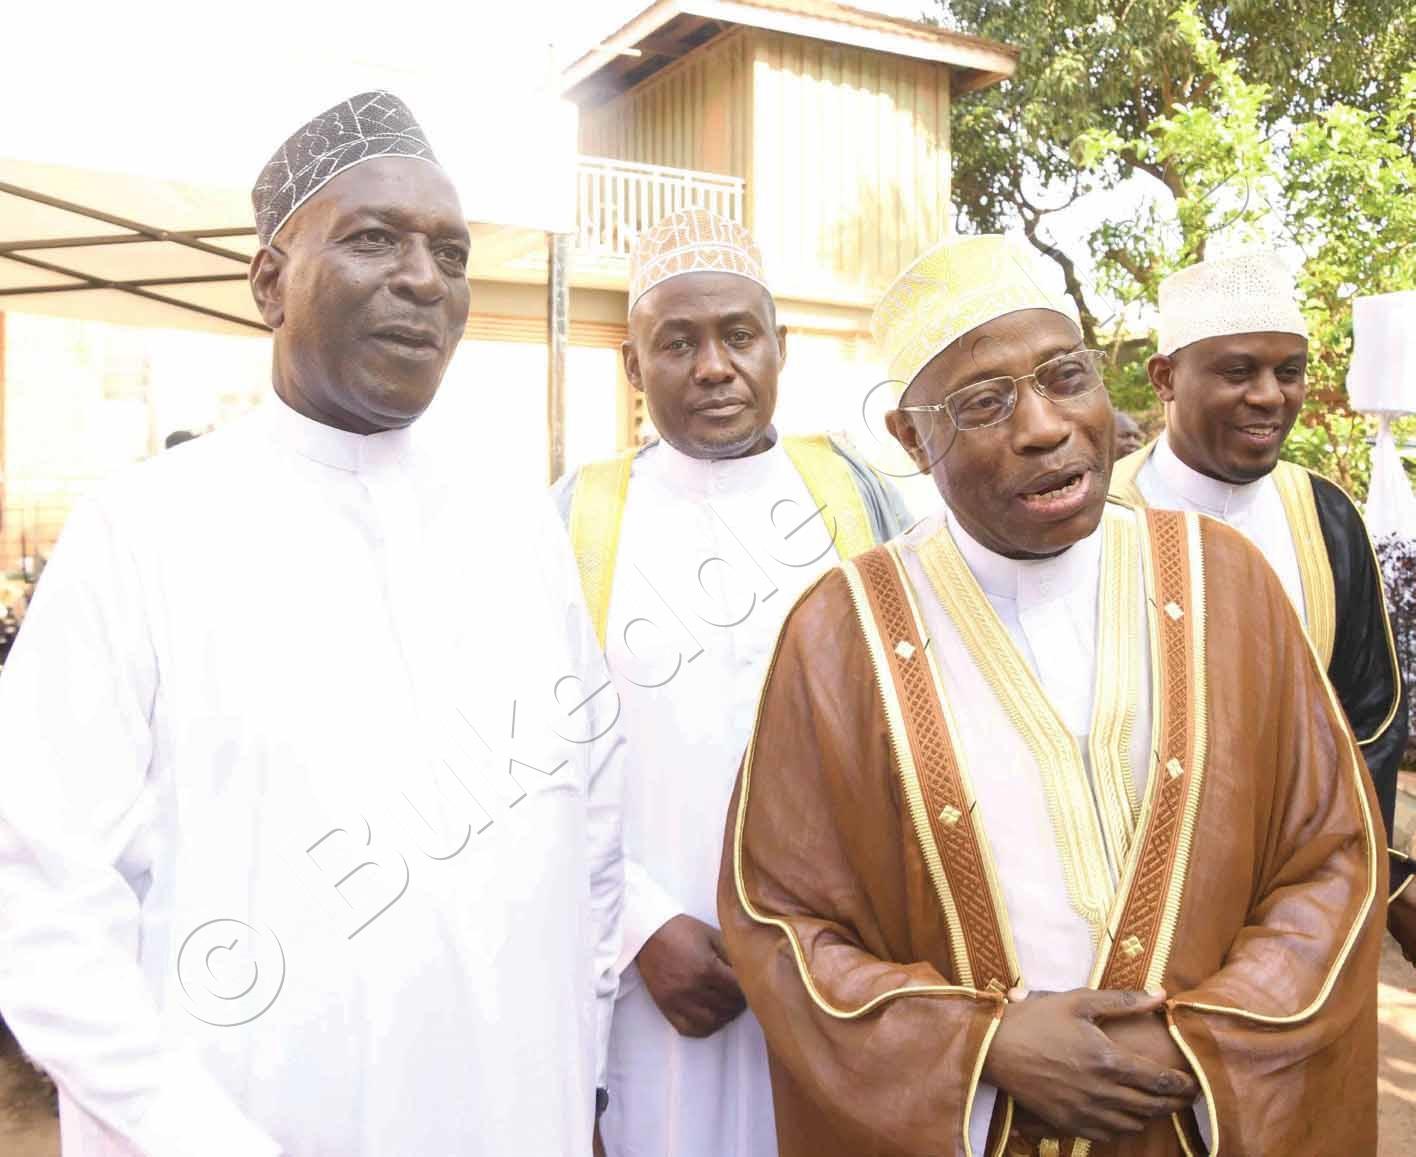 Muzaata Ne Supreme Mufti Ndirangwa Gye Buvuddeko